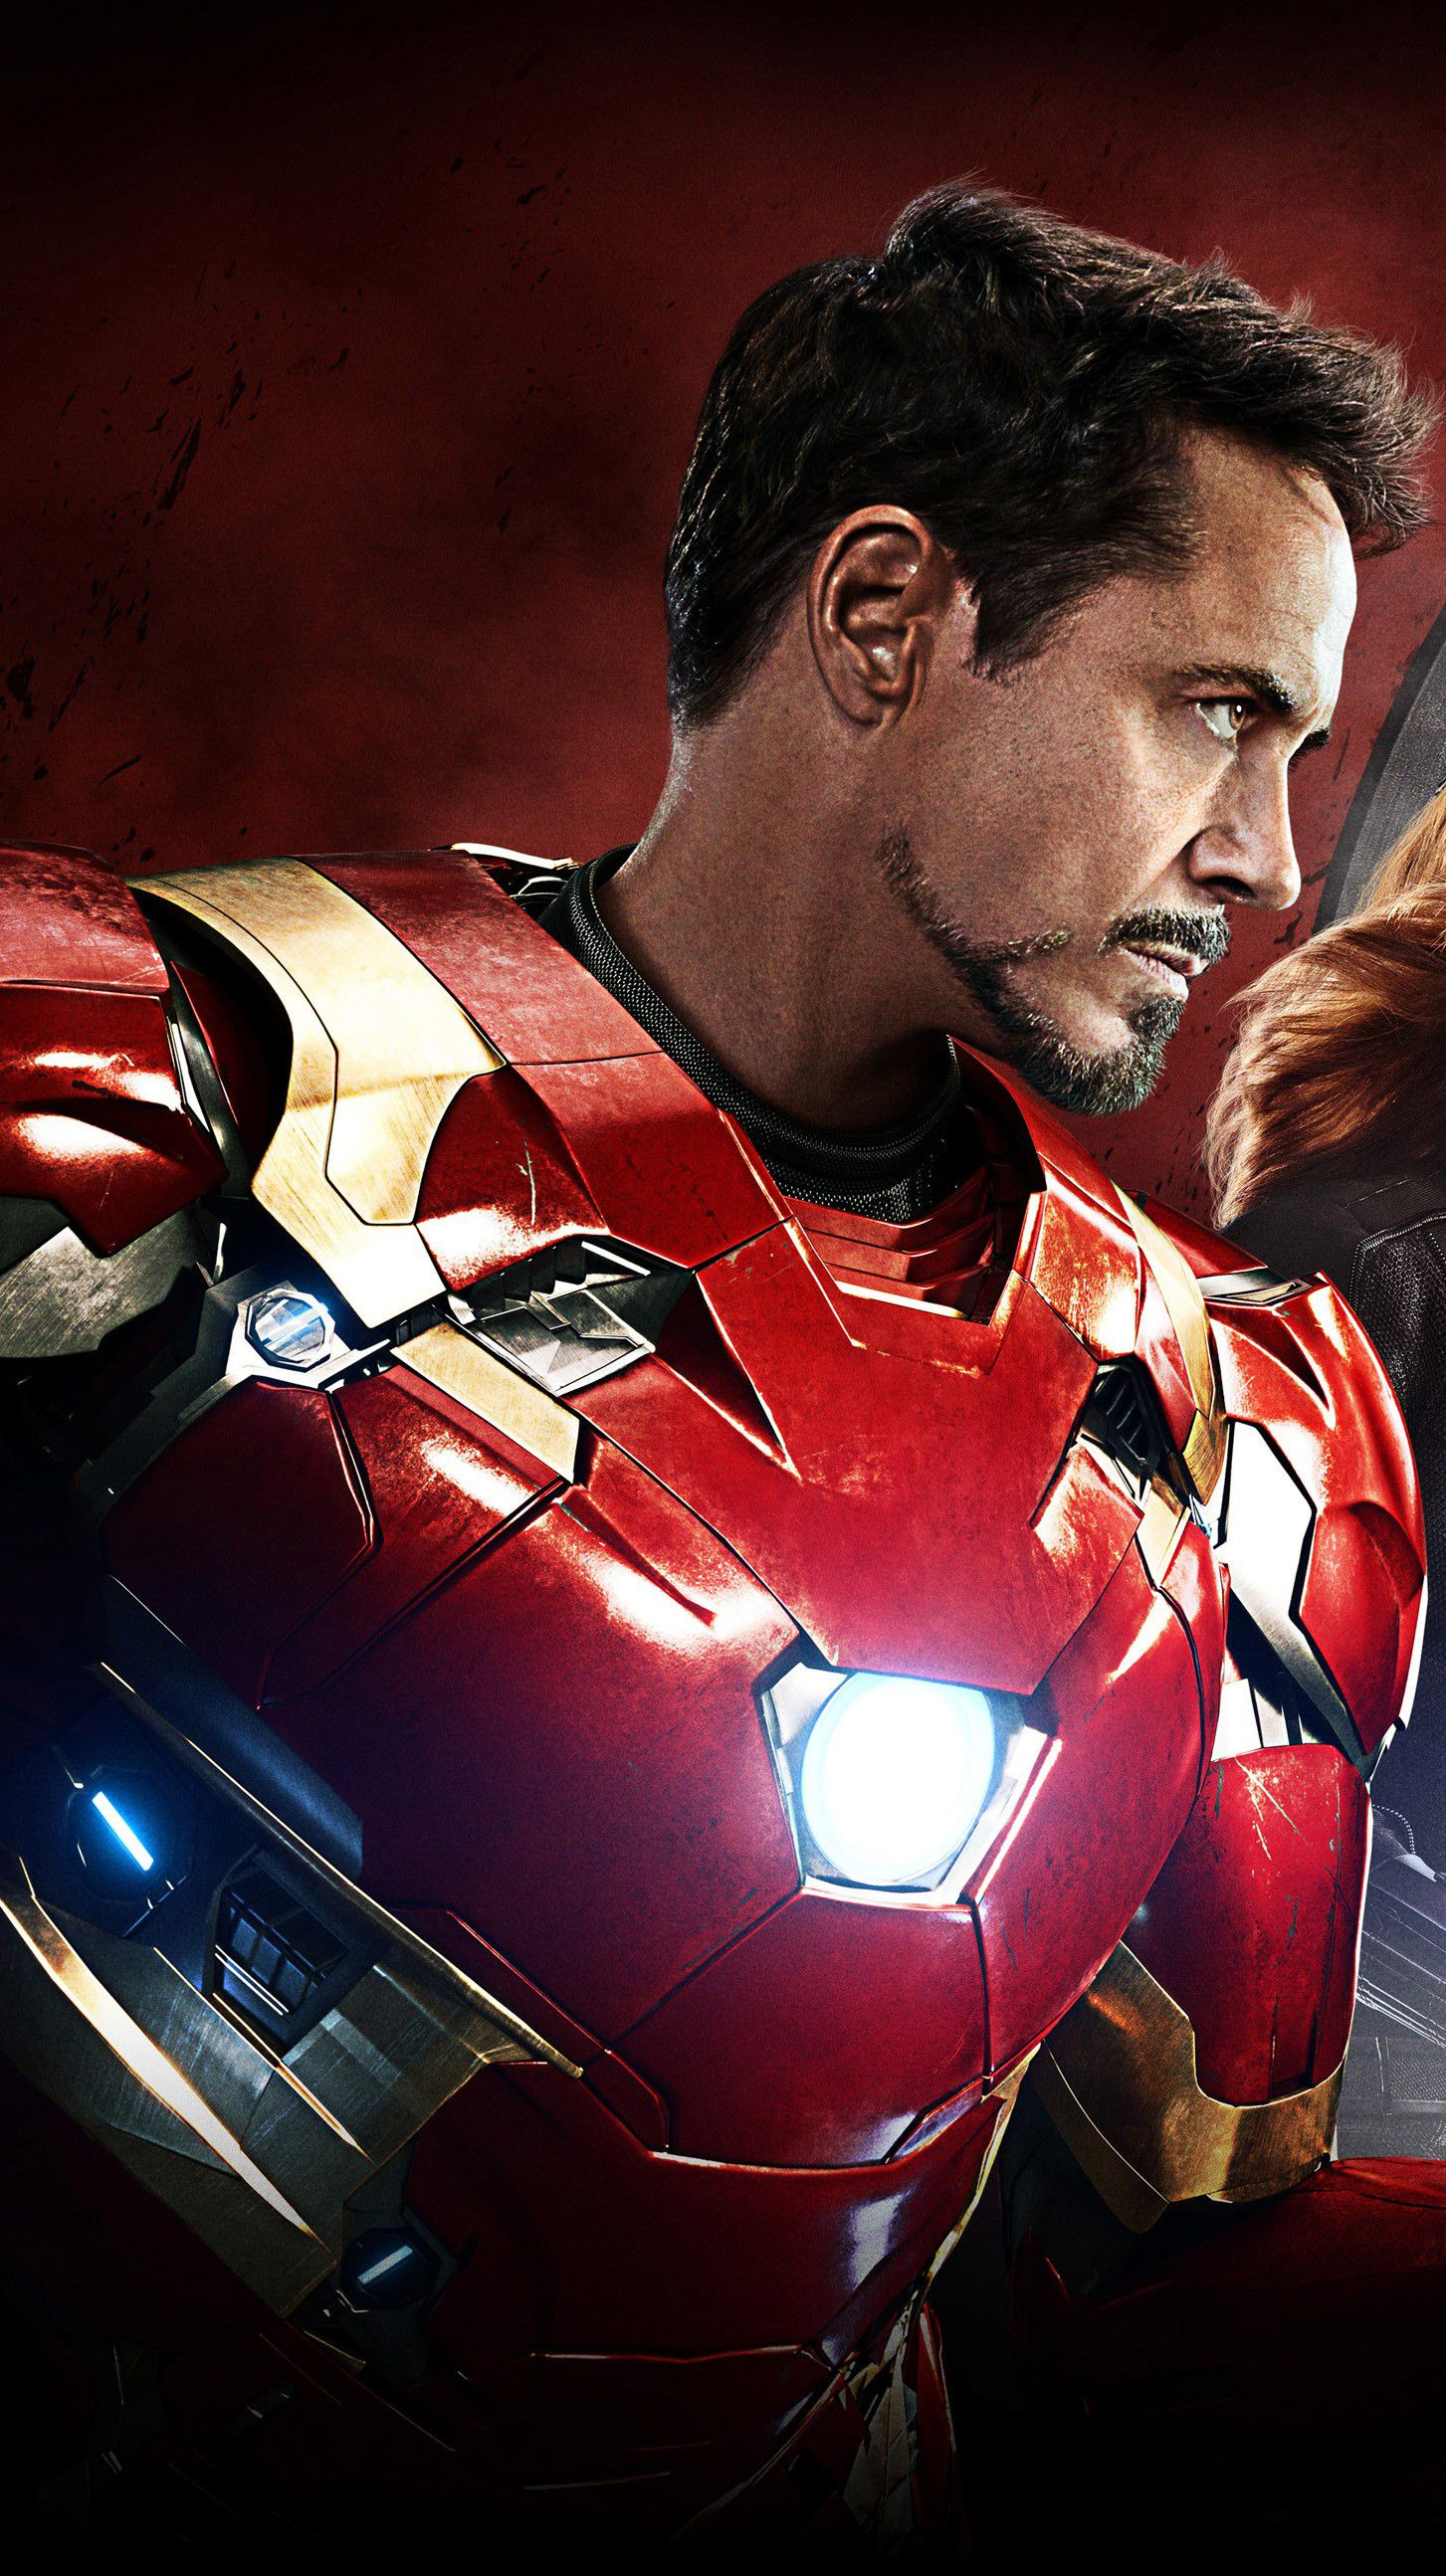 Iron Man Mobile Hd Wallpaper In 2020 Iron Man Wallpaper Hero Wallpaper Iron Man Hd Wallpaper